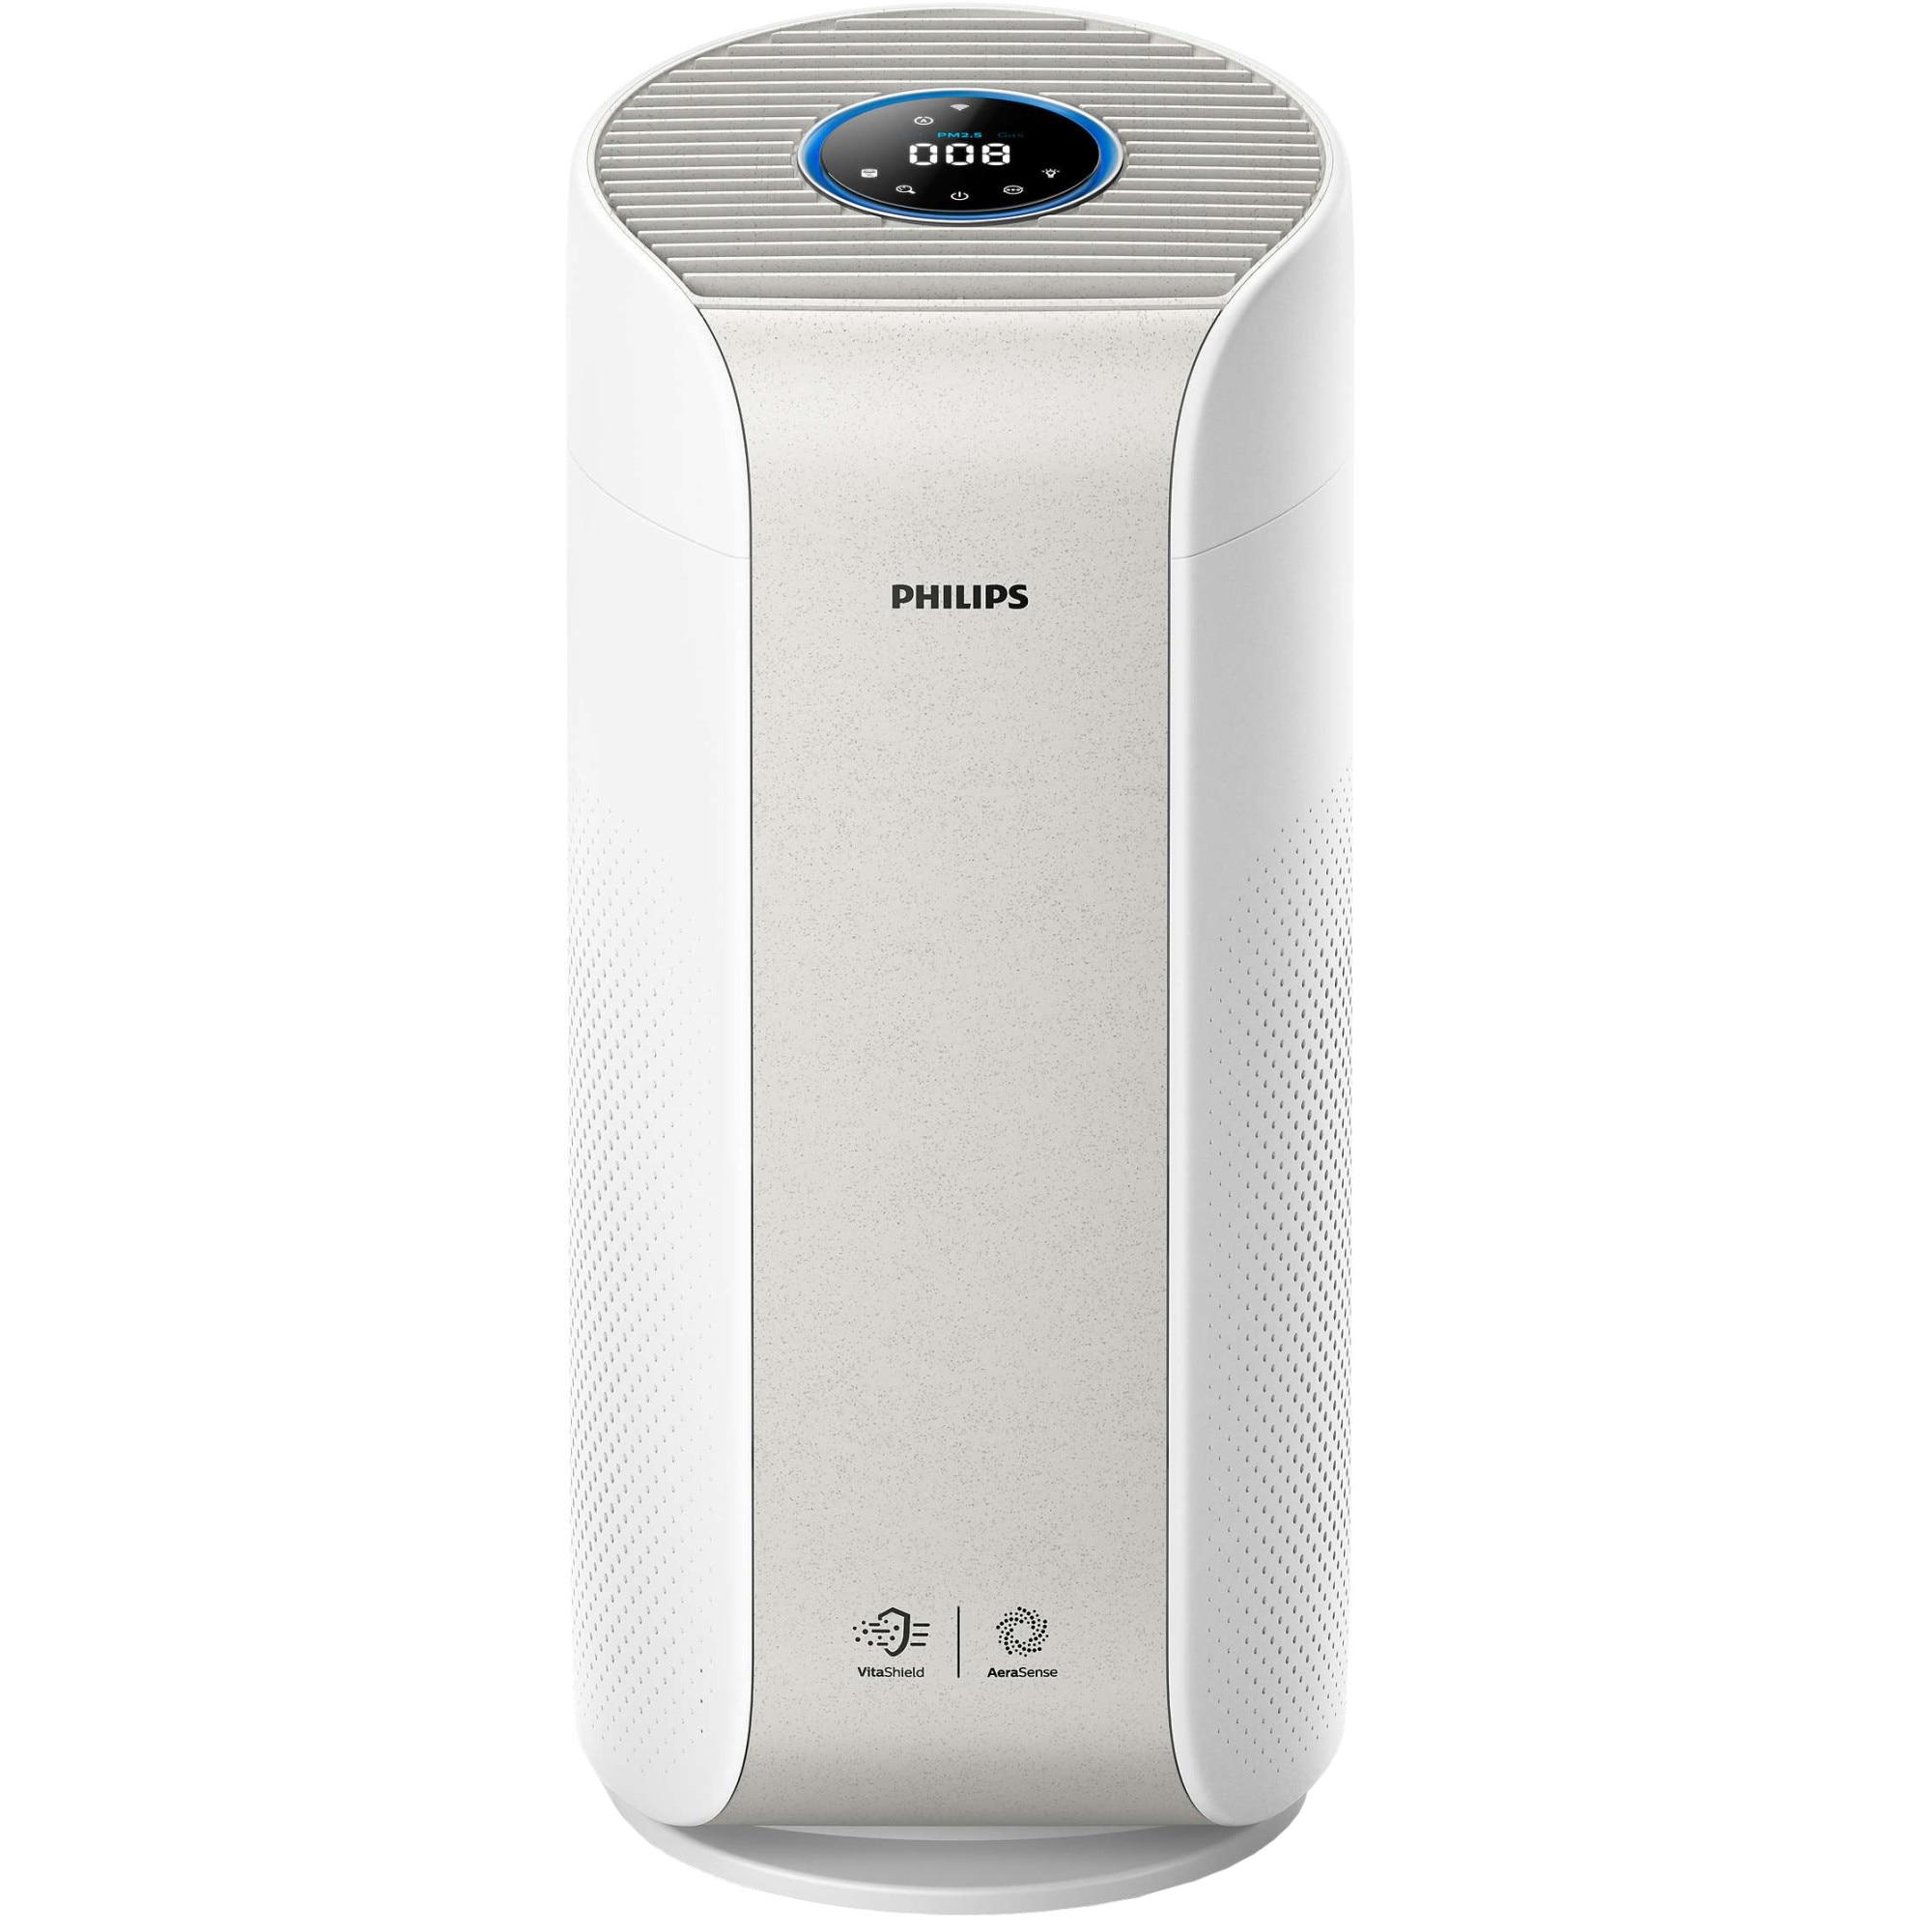 Fotografie Purificator de aer Philips AC3055/50, Tehnologie AeraSense, Tehnologie VitaShield, Feedback real privind calitatea aerului, Conectivitate Bluetooth, 3 moduri automate, afisaj digital, Senzor PM2,5, Alb